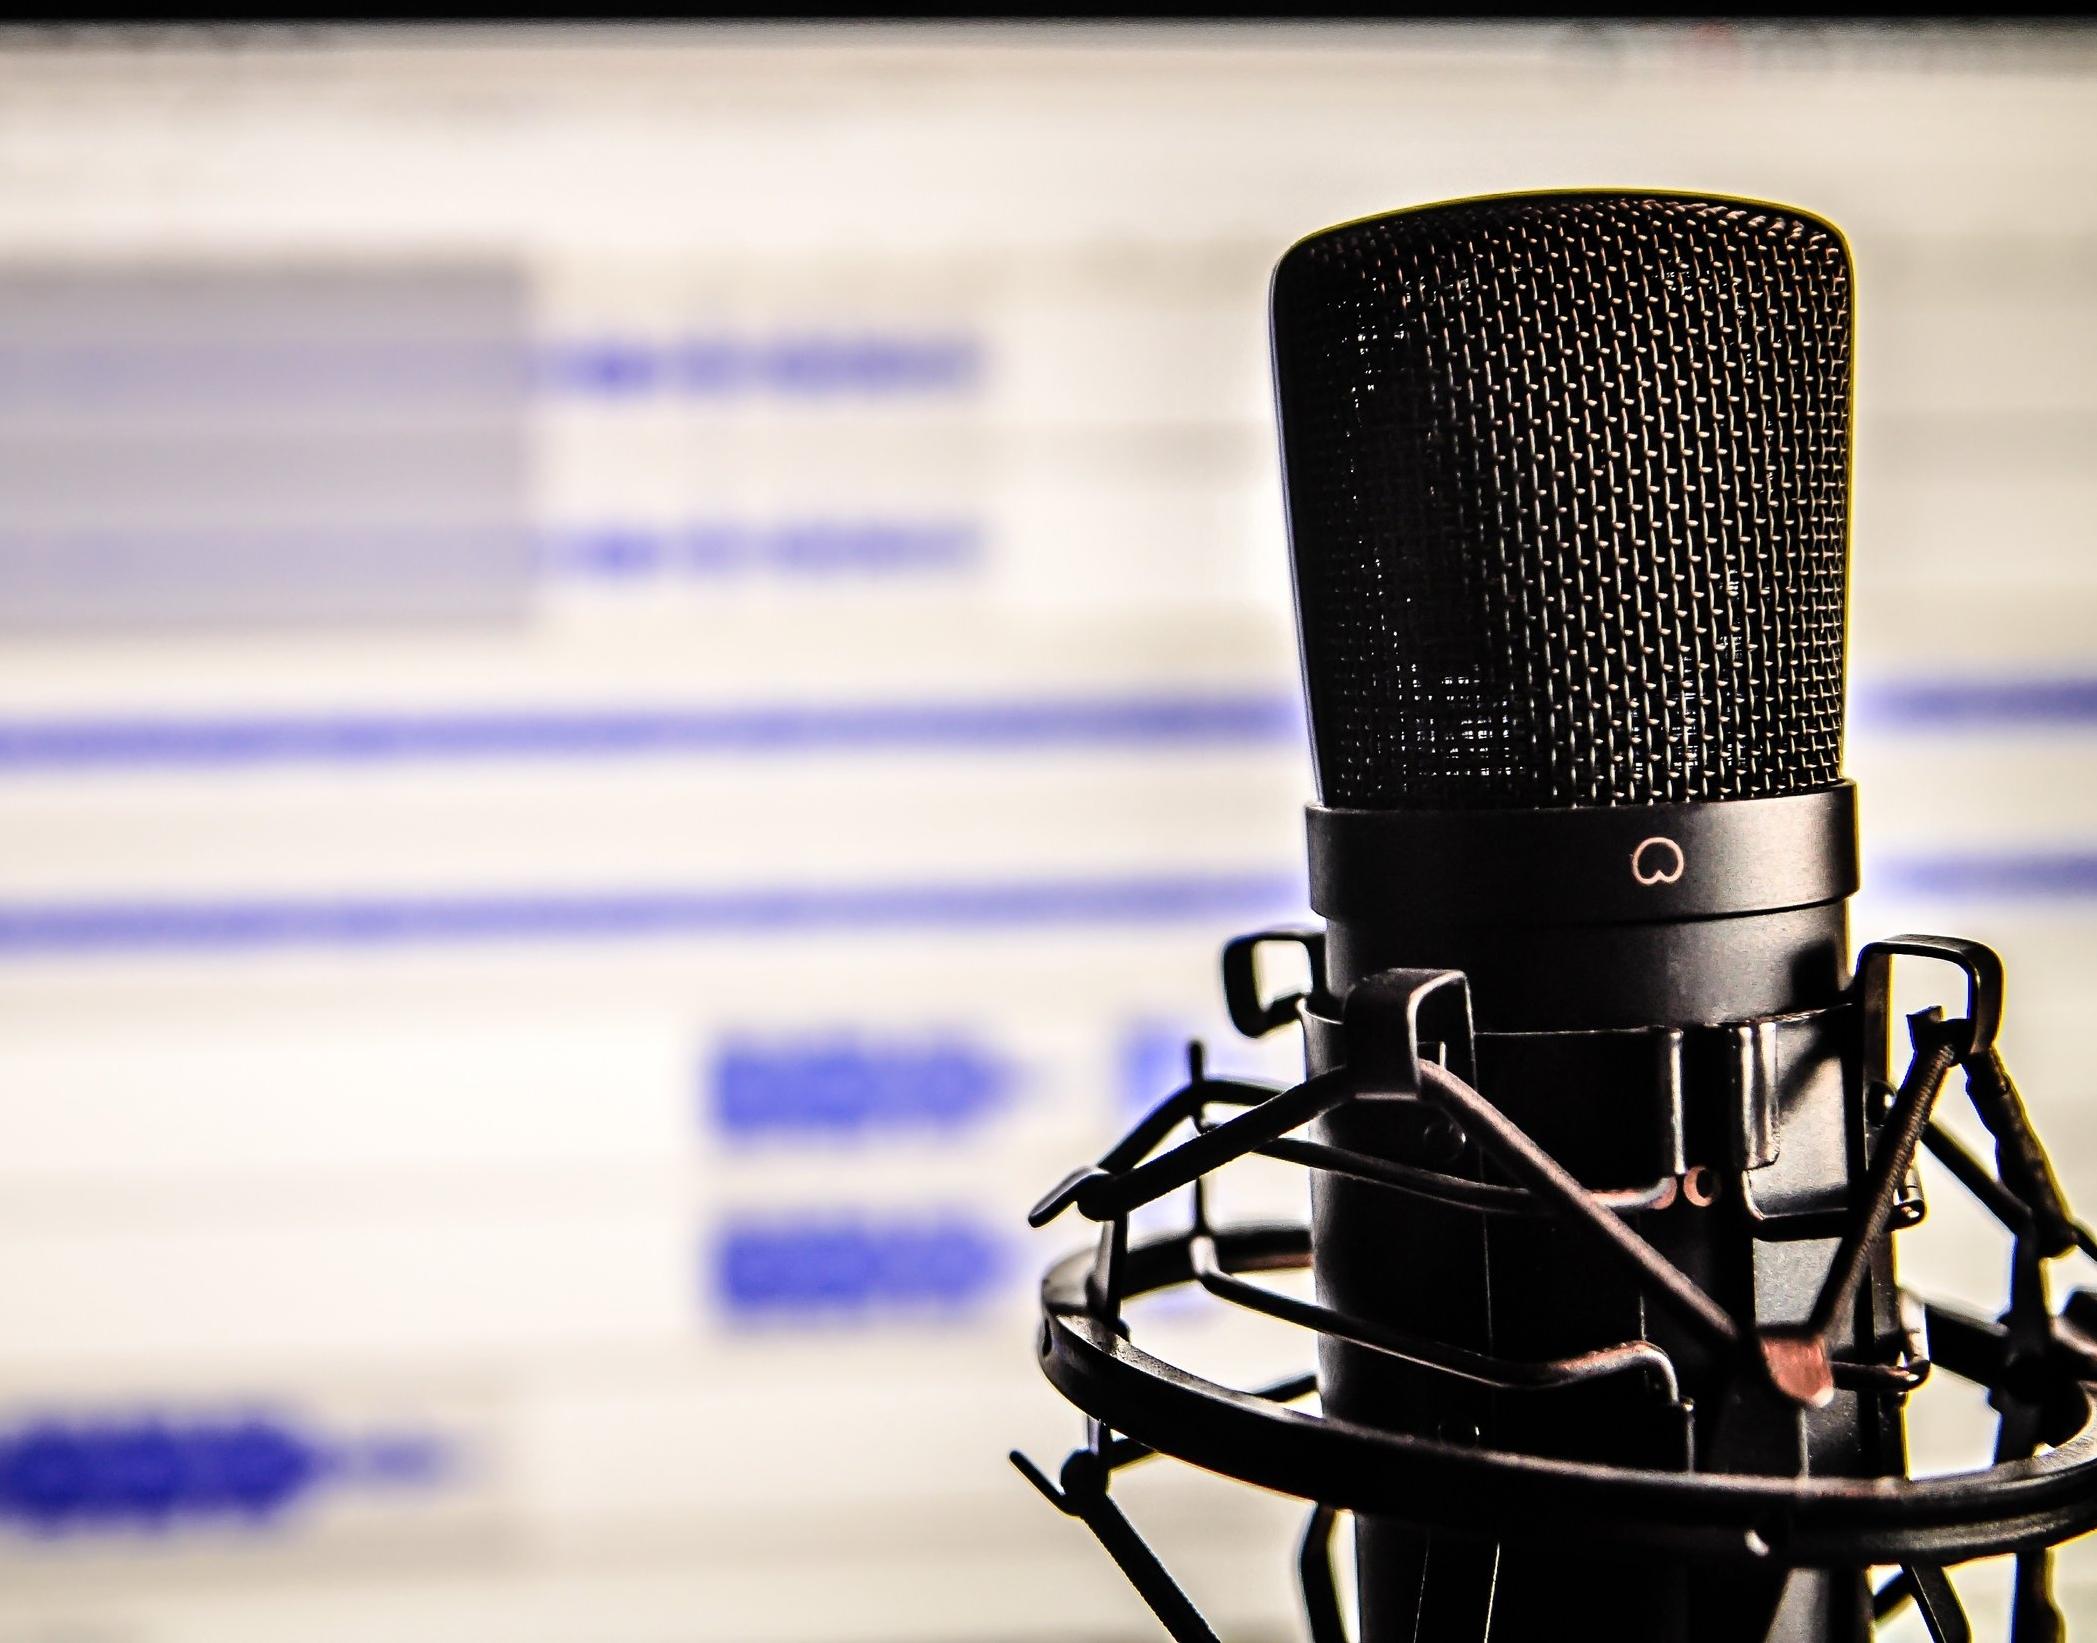 microphone-audio-computer-sound-recording-55800.jpg